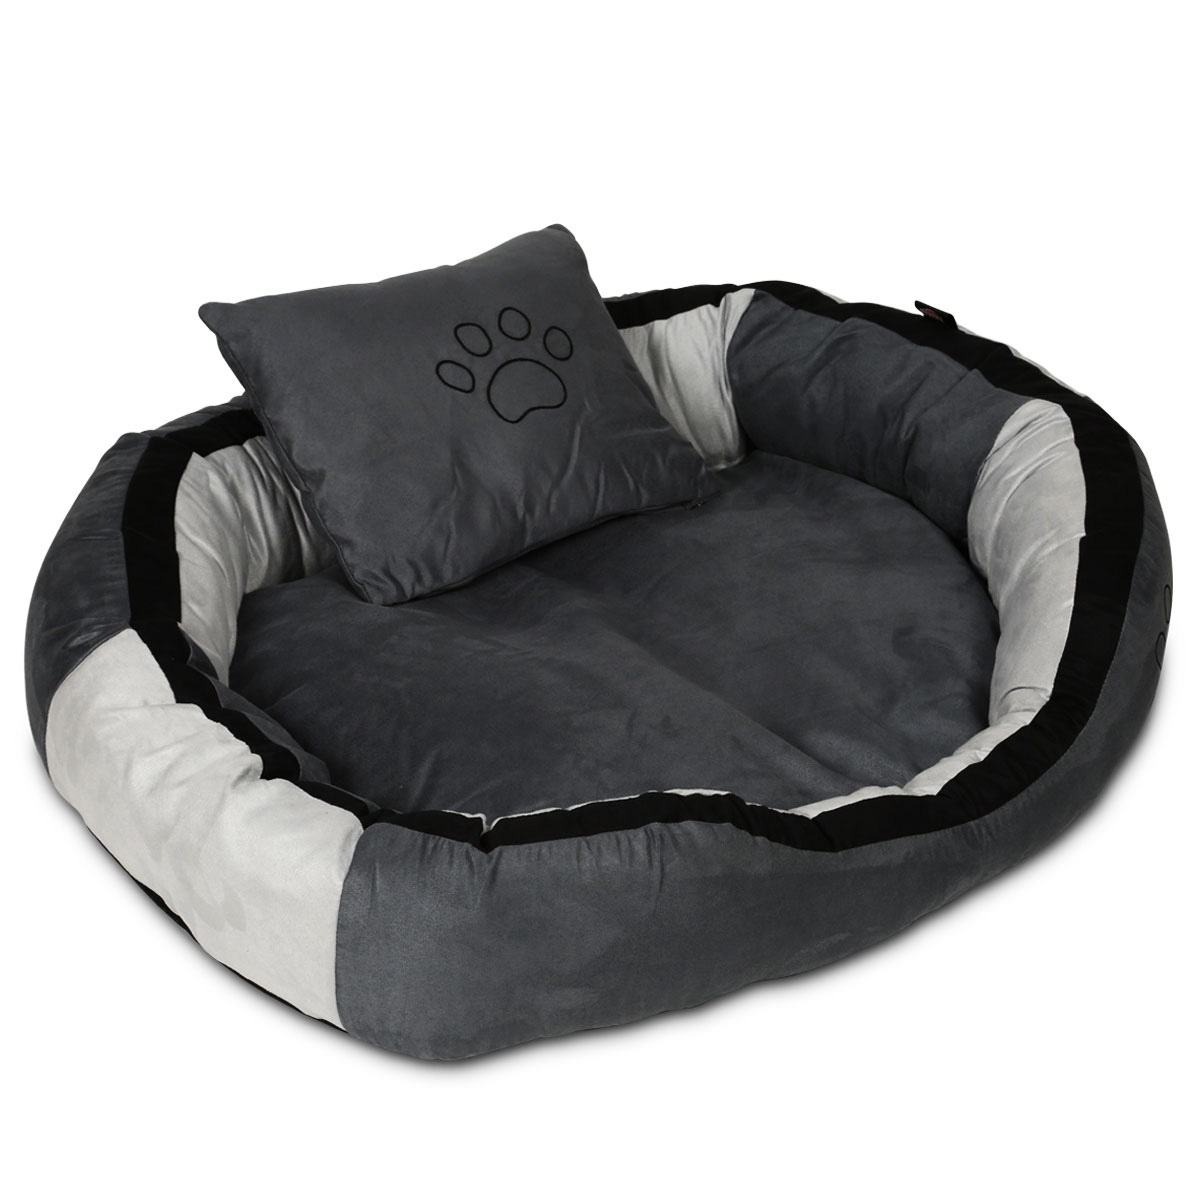 trixie bett bonzo grau schwarz g nstig kaufen bei zooroyal. Black Bedroom Furniture Sets. Home Design Ideas